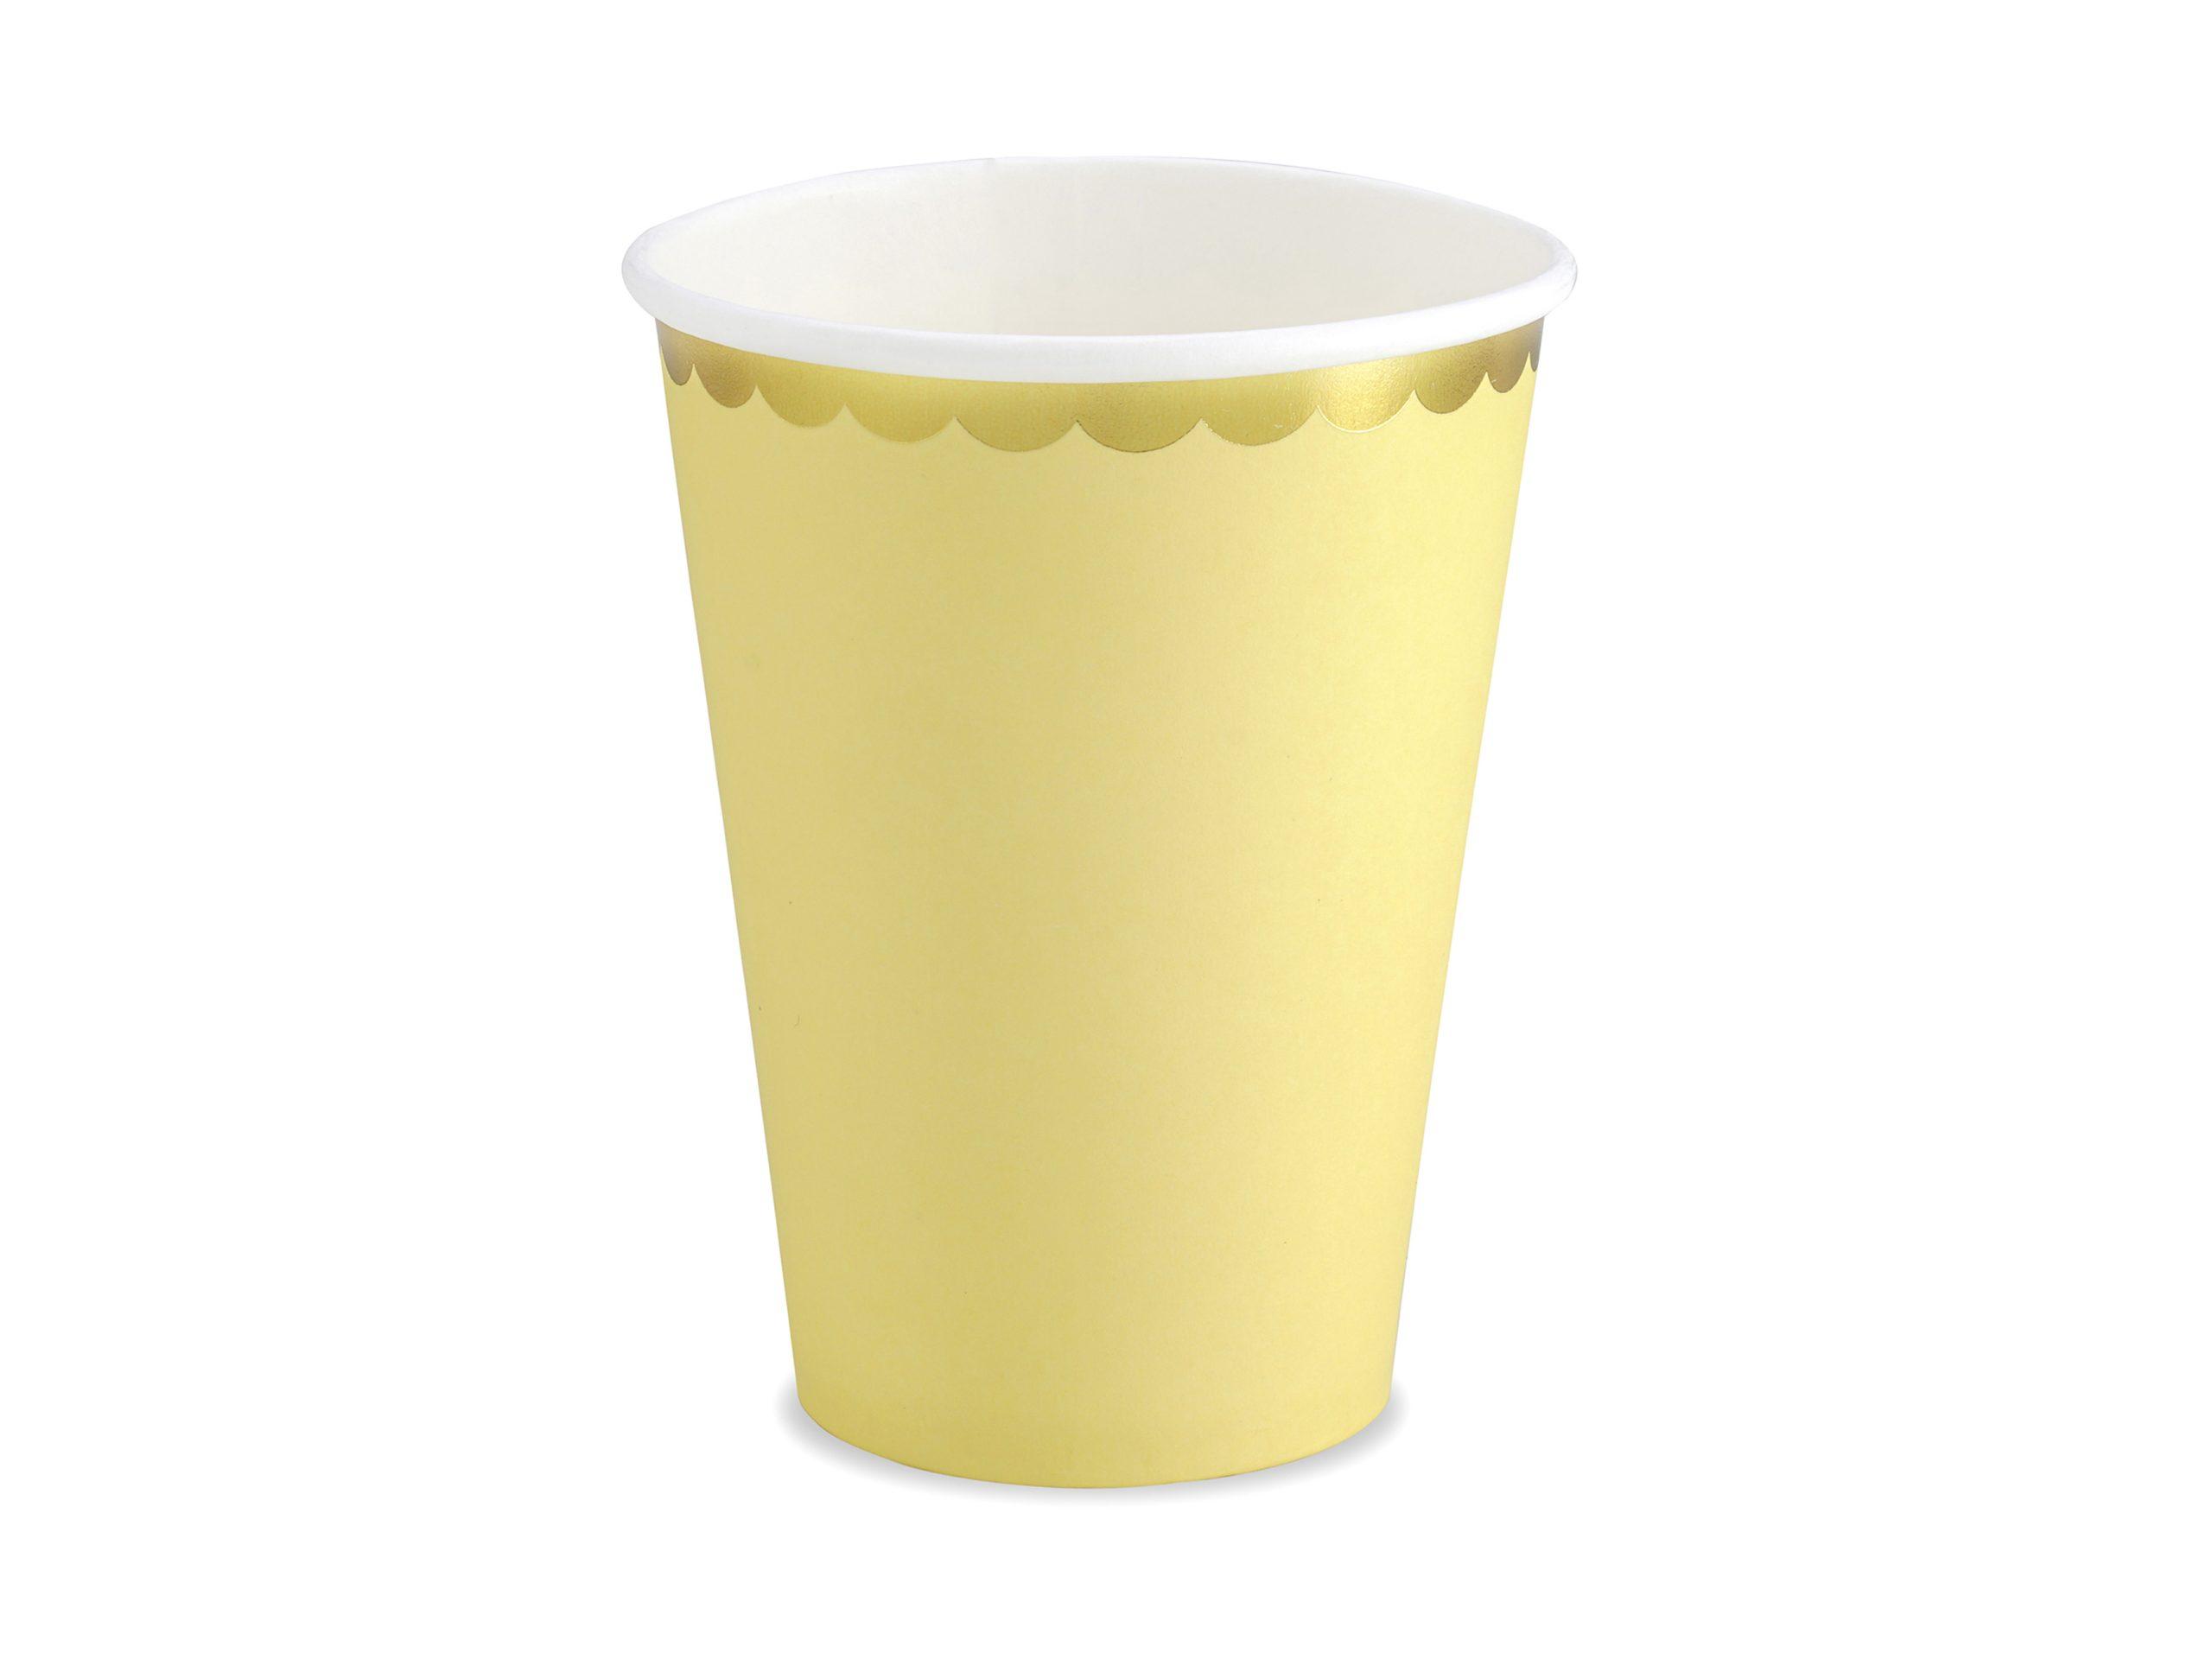 Vaso amarillo